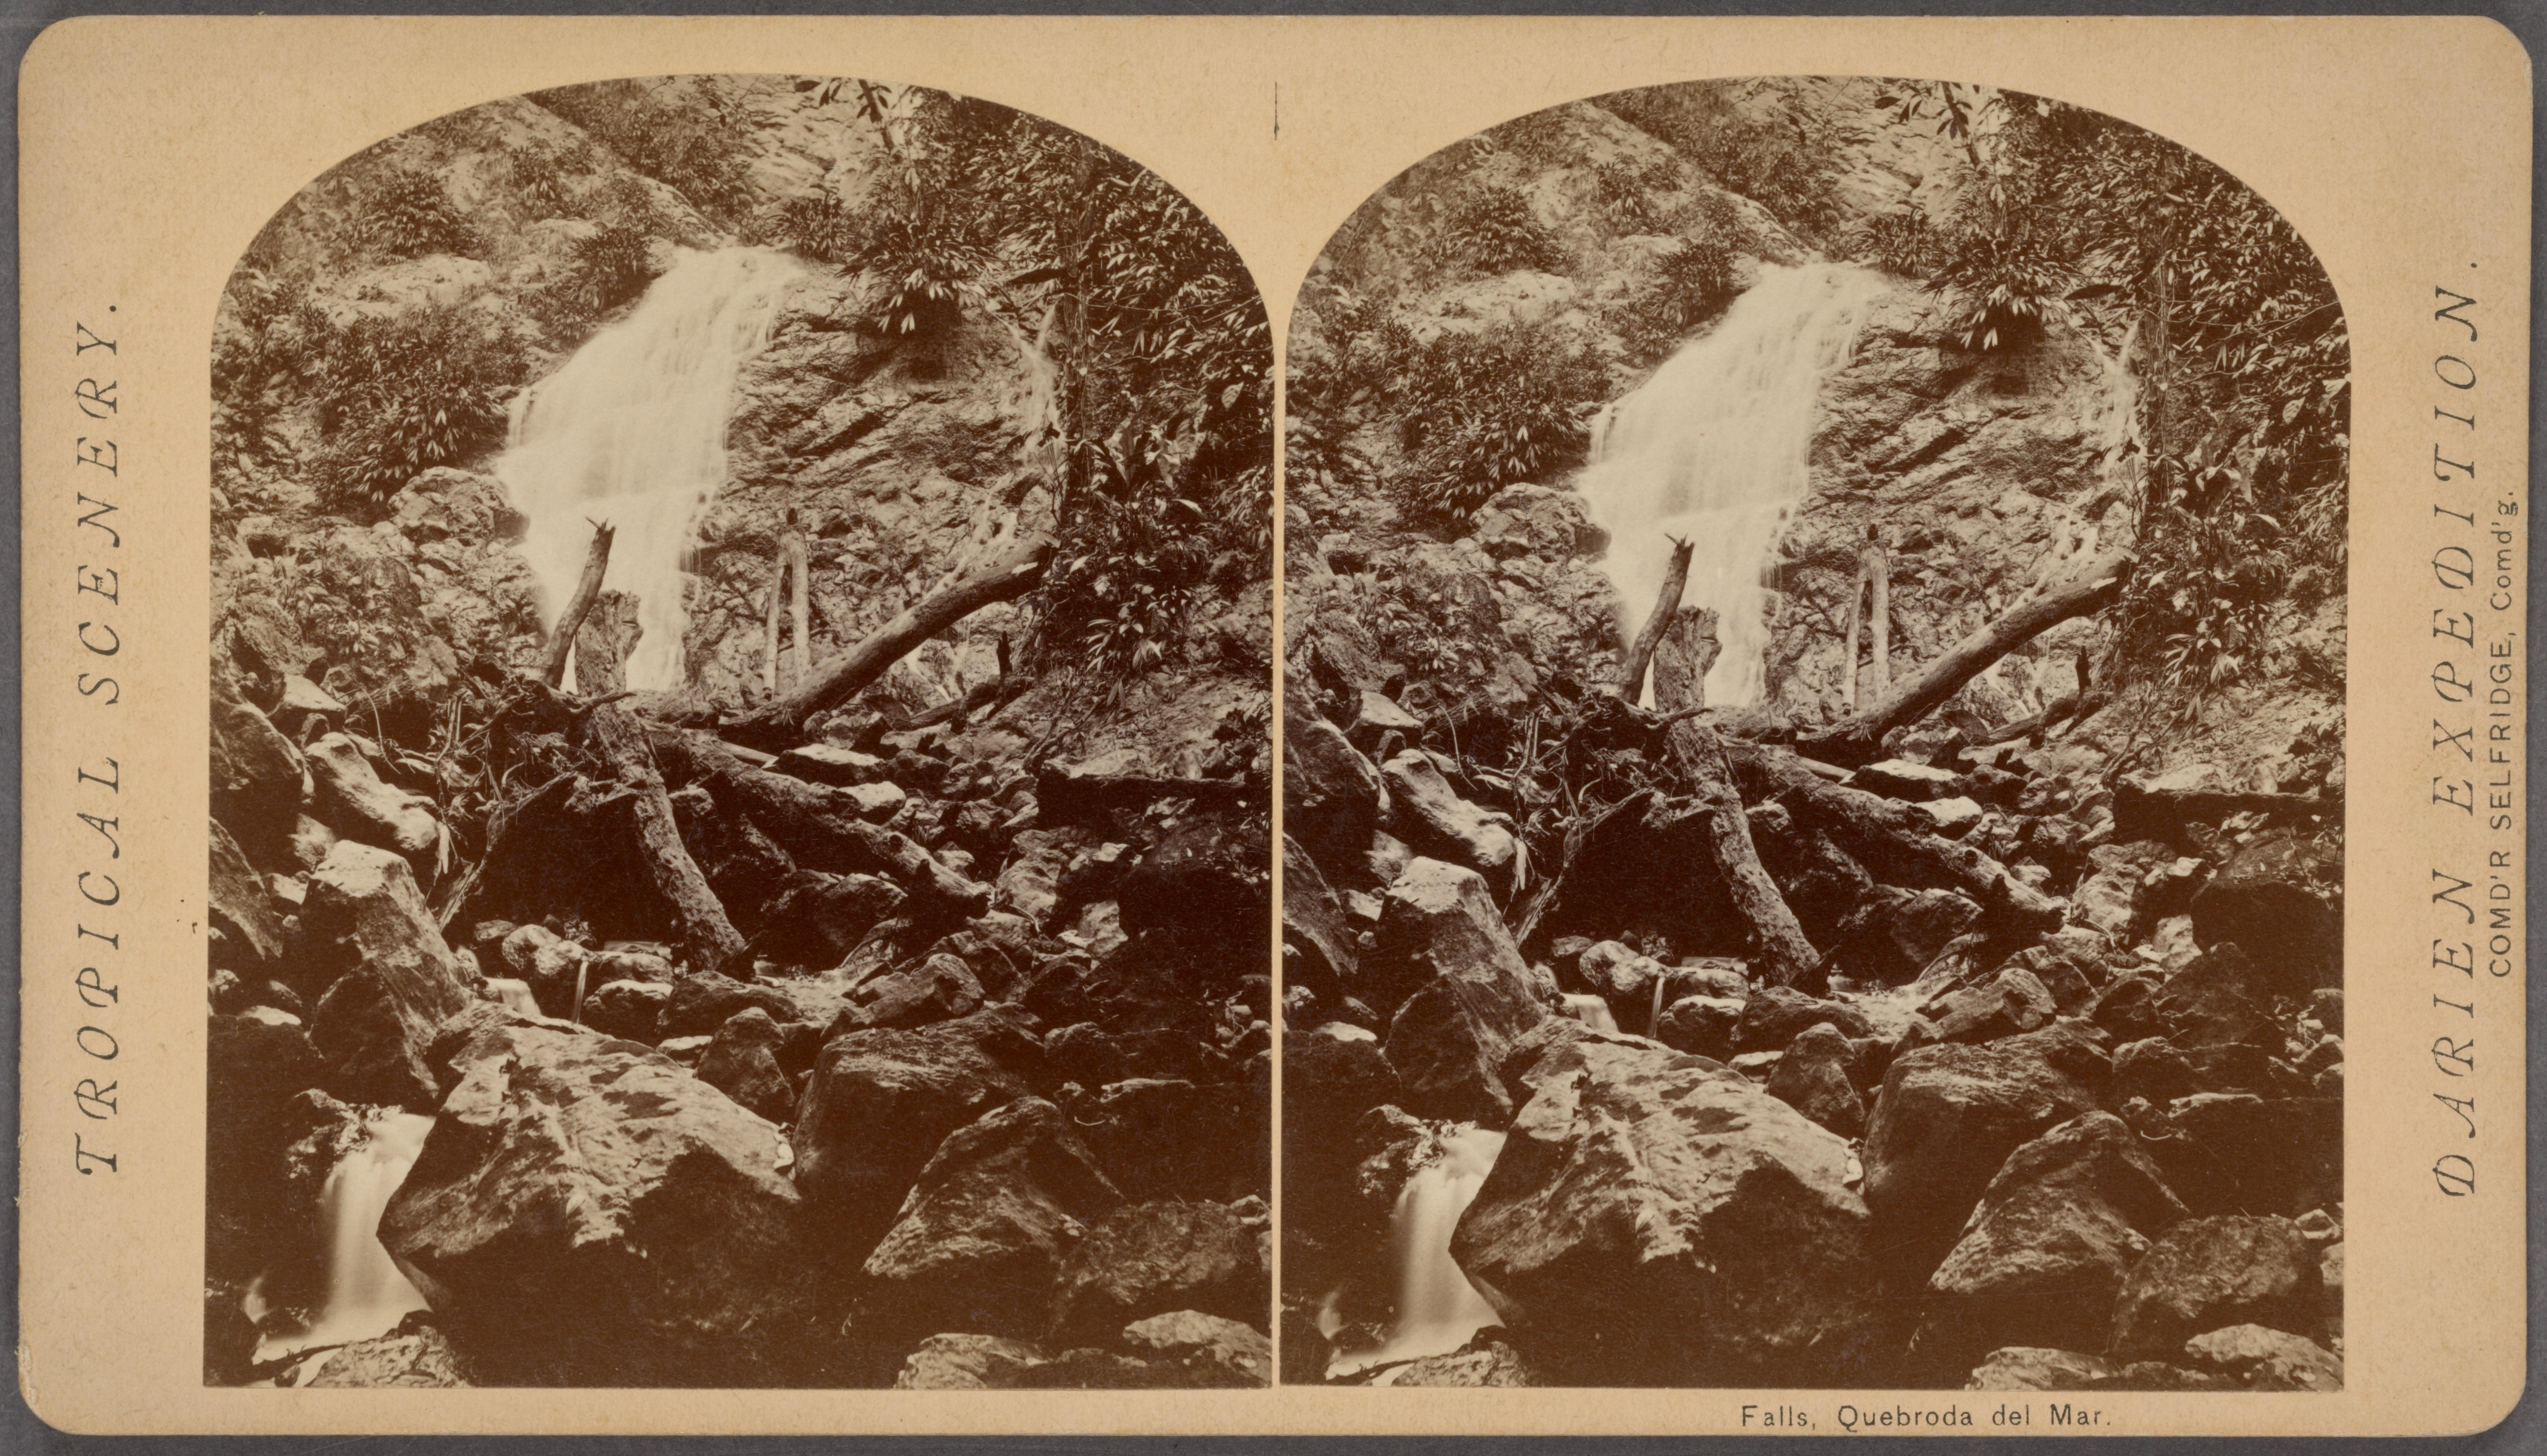 File:Falls, Quebroda del Mar, by O'Sullivan, Timothy H